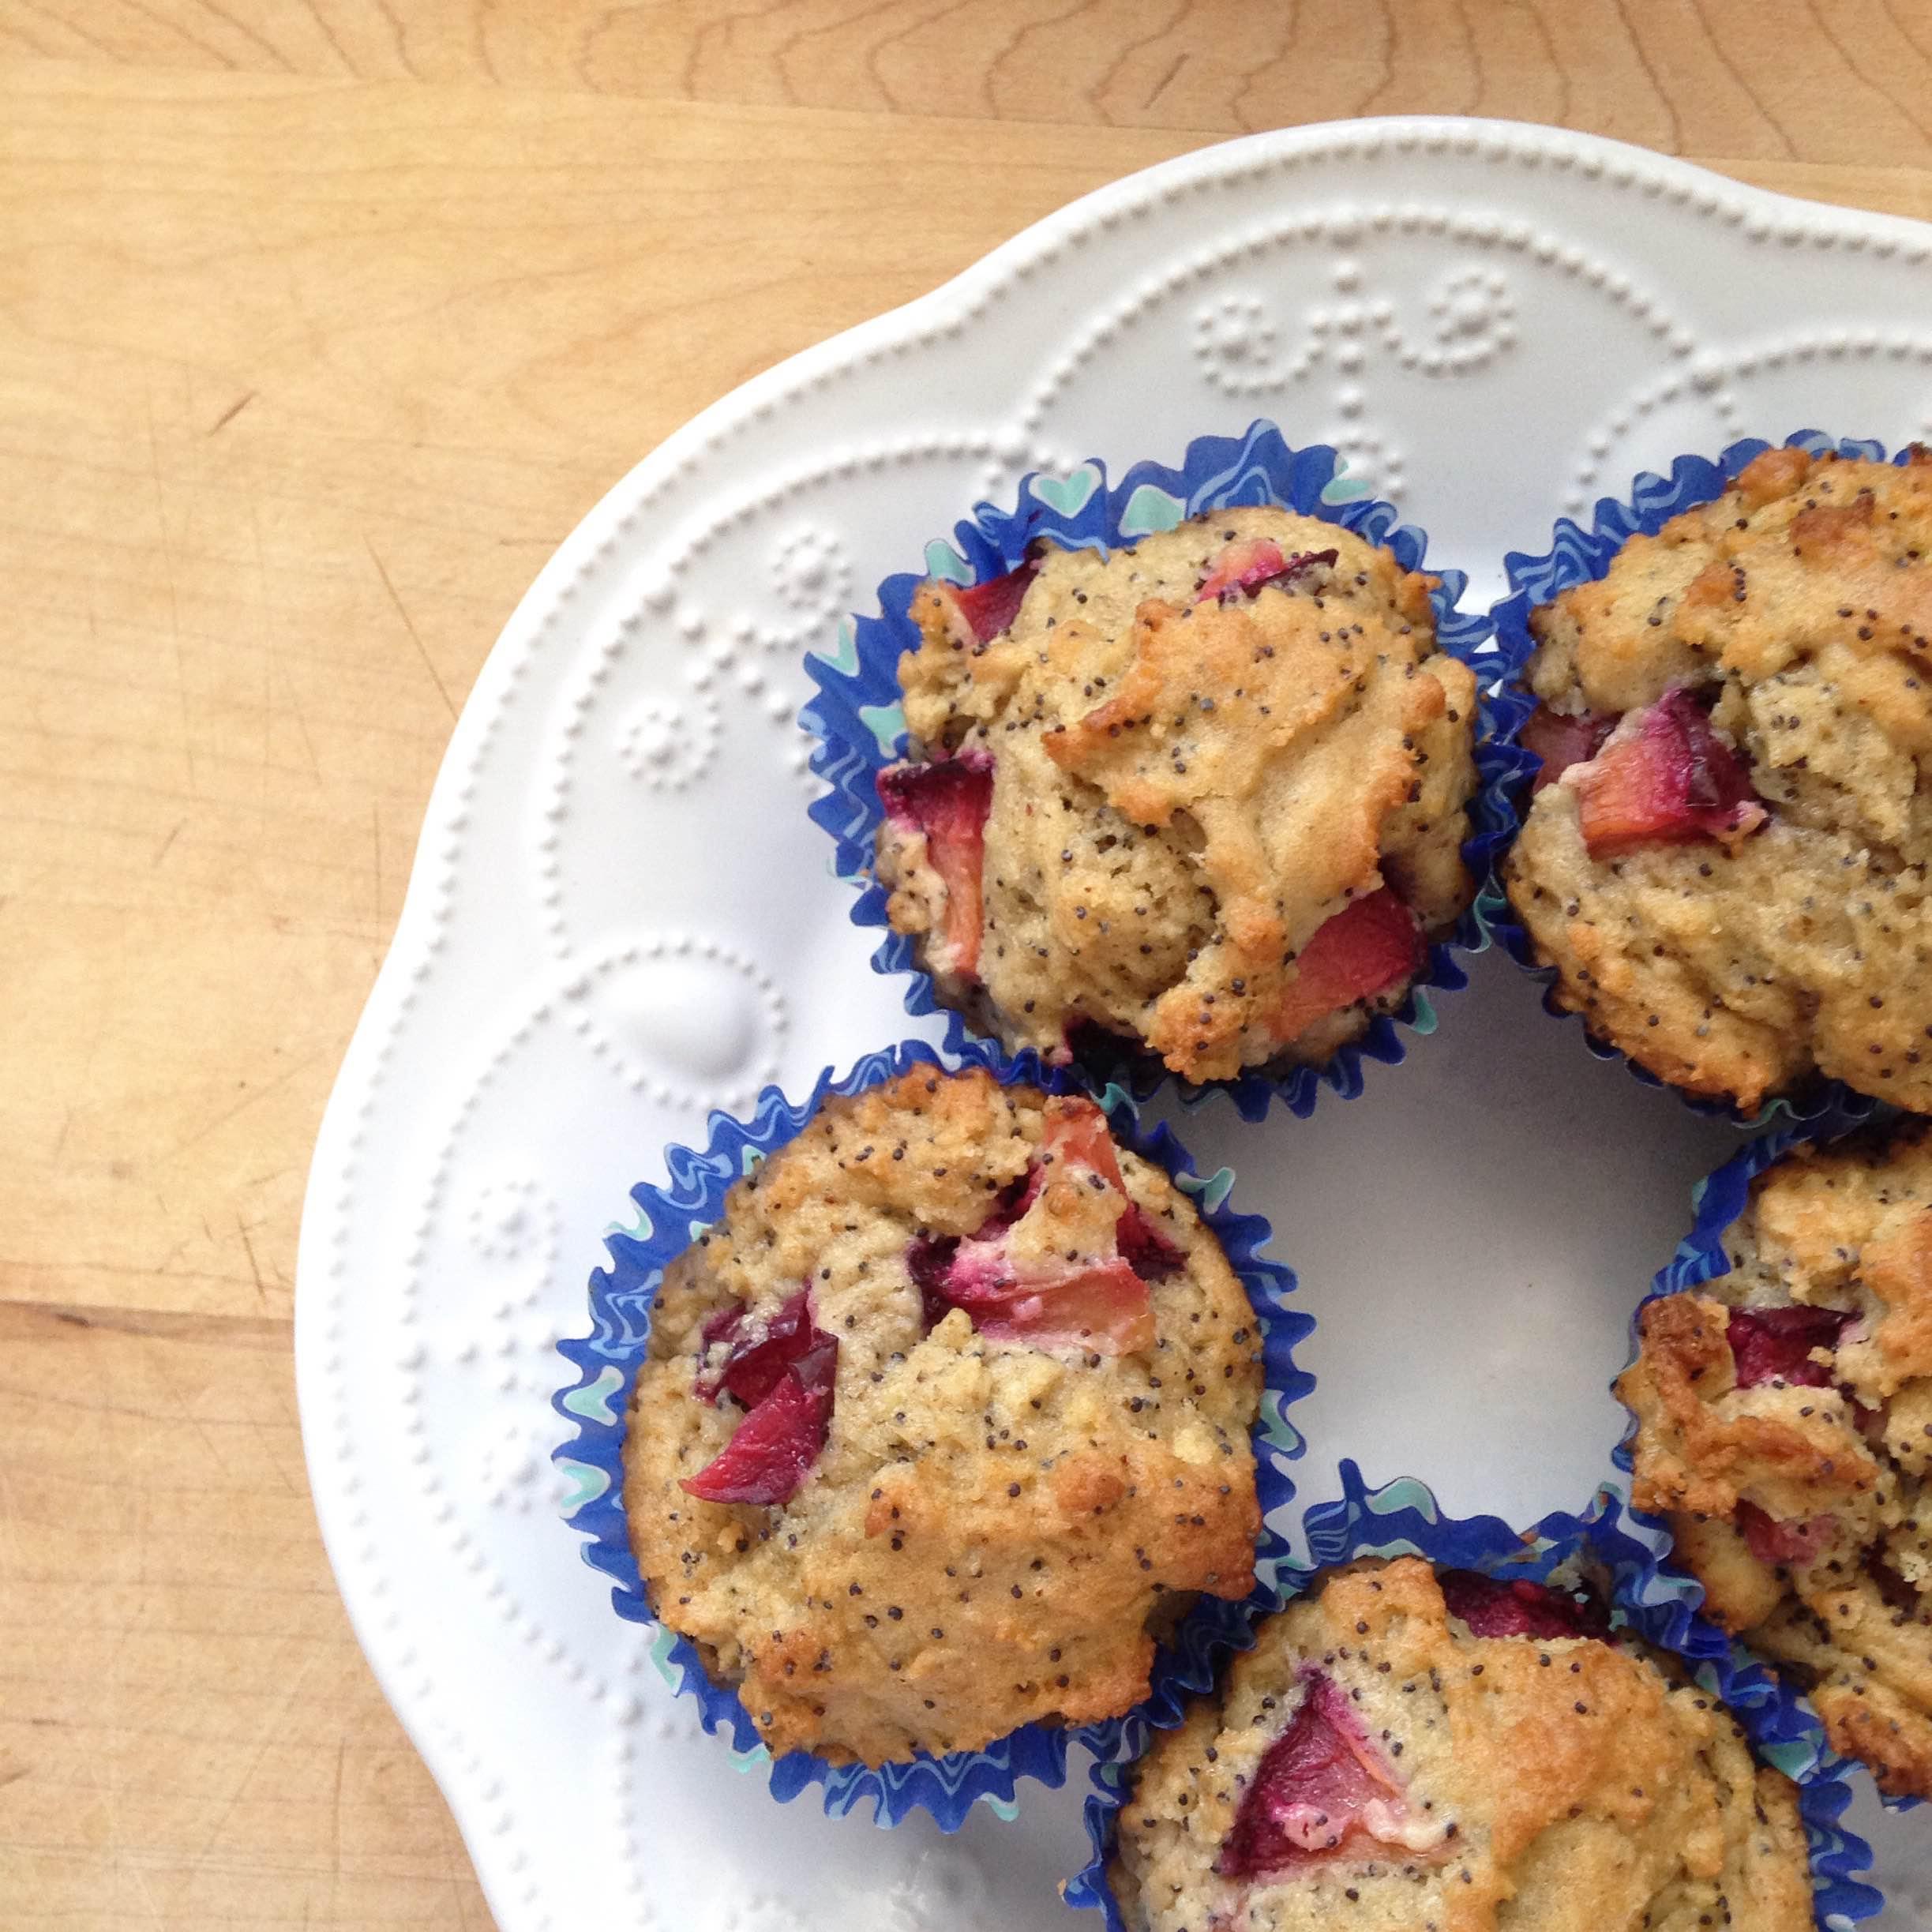 'Summer's Haul' Plum Poppy Seed Muffins